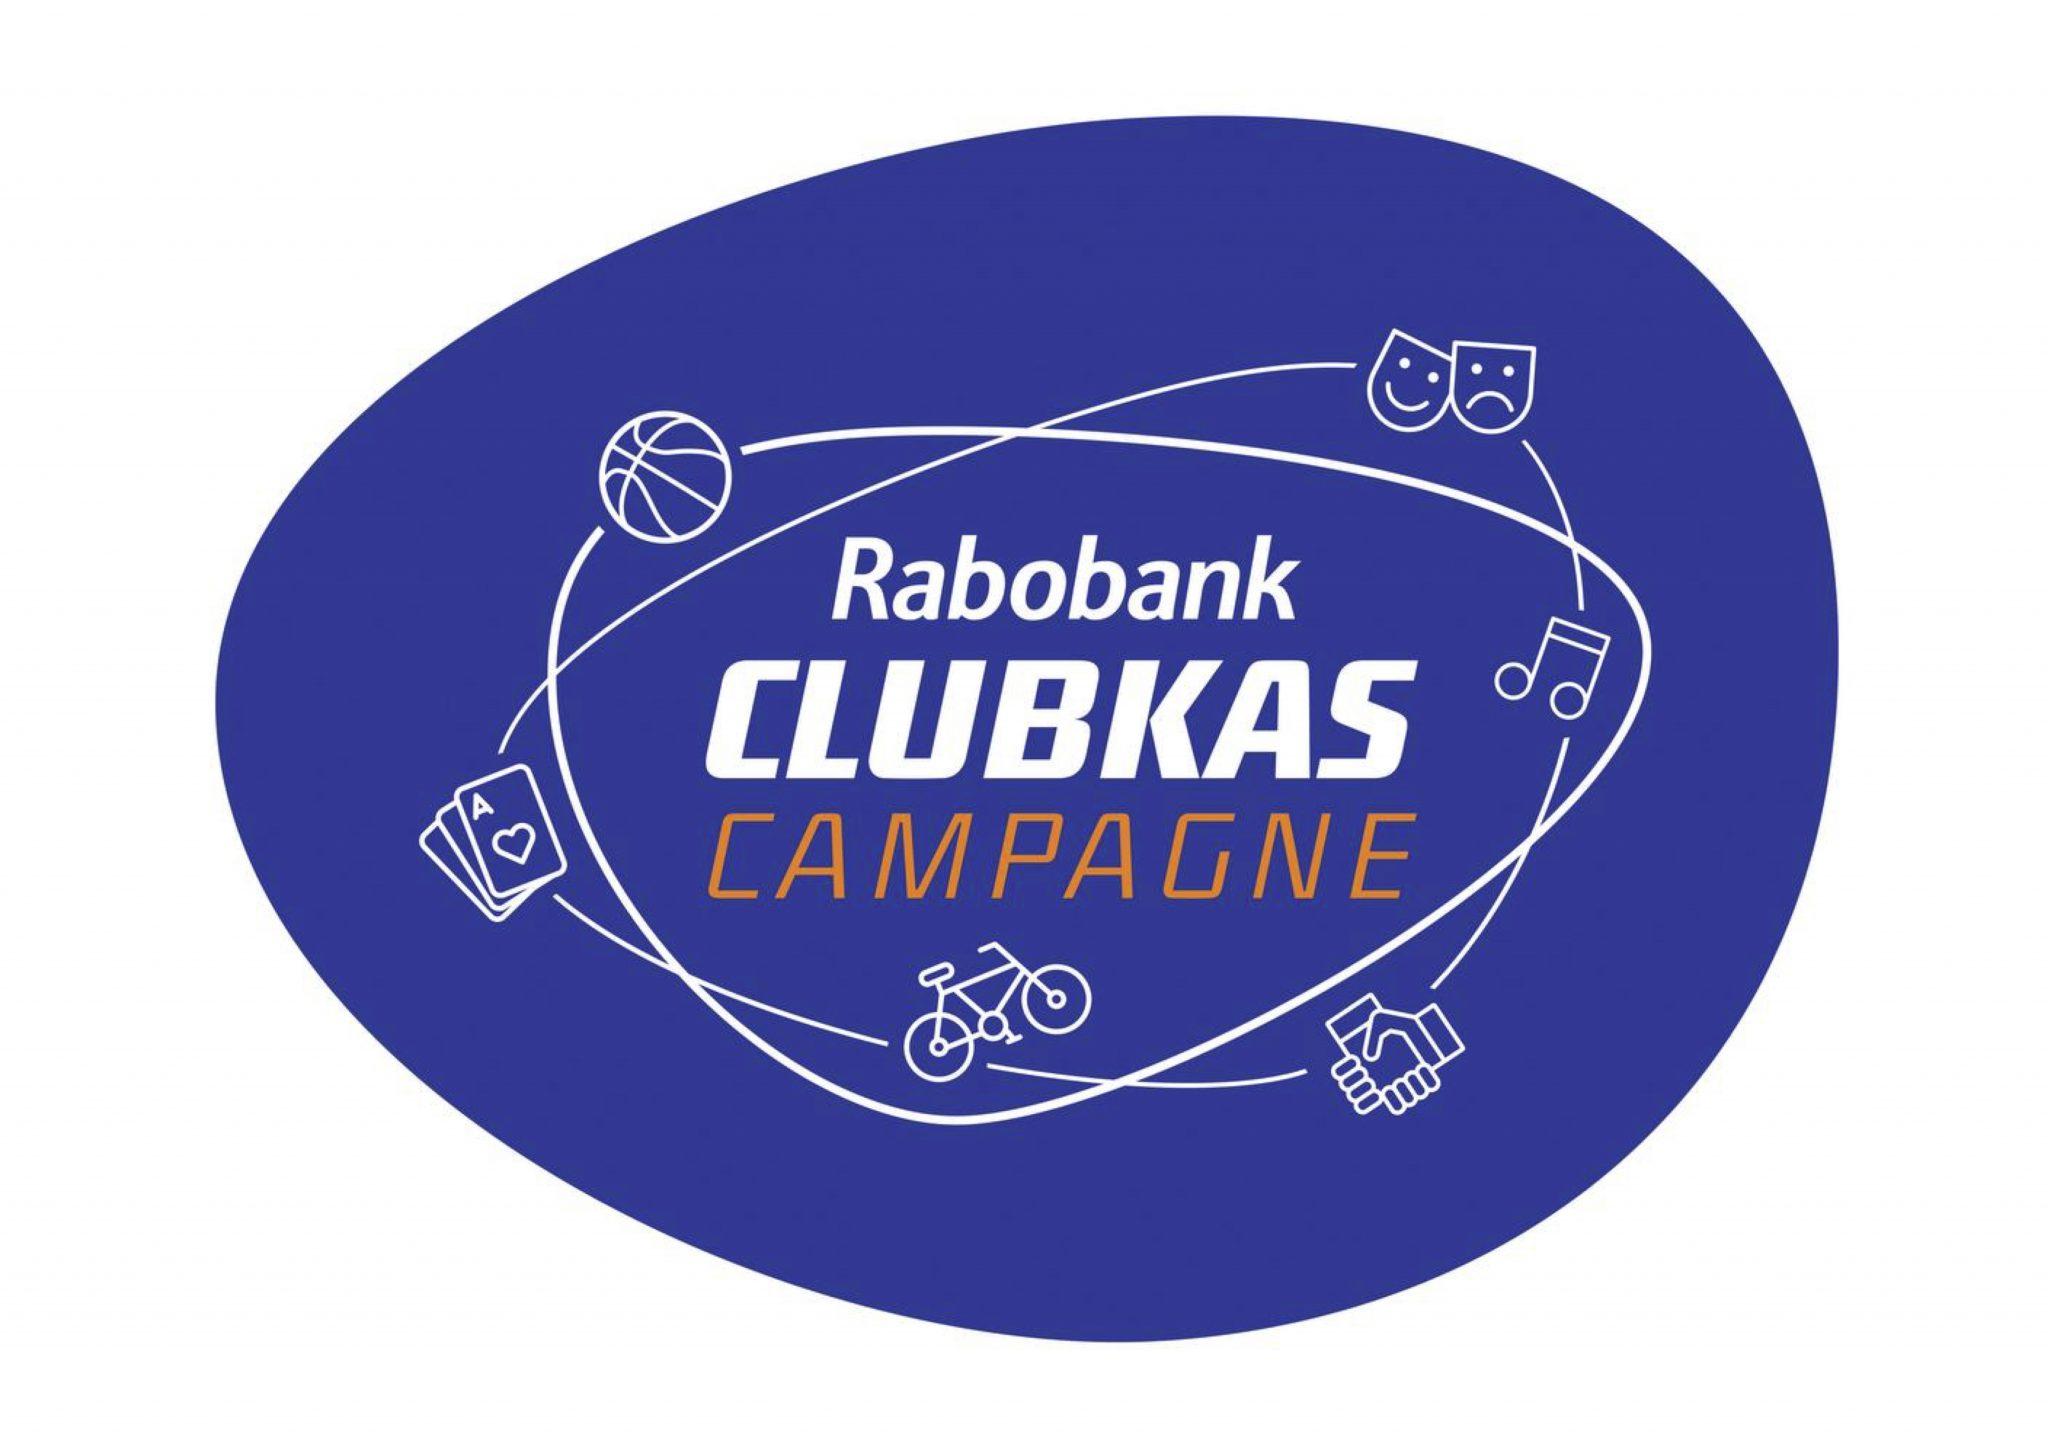 Rabo Clubkas, ook Volksvermaken Vries doet mee